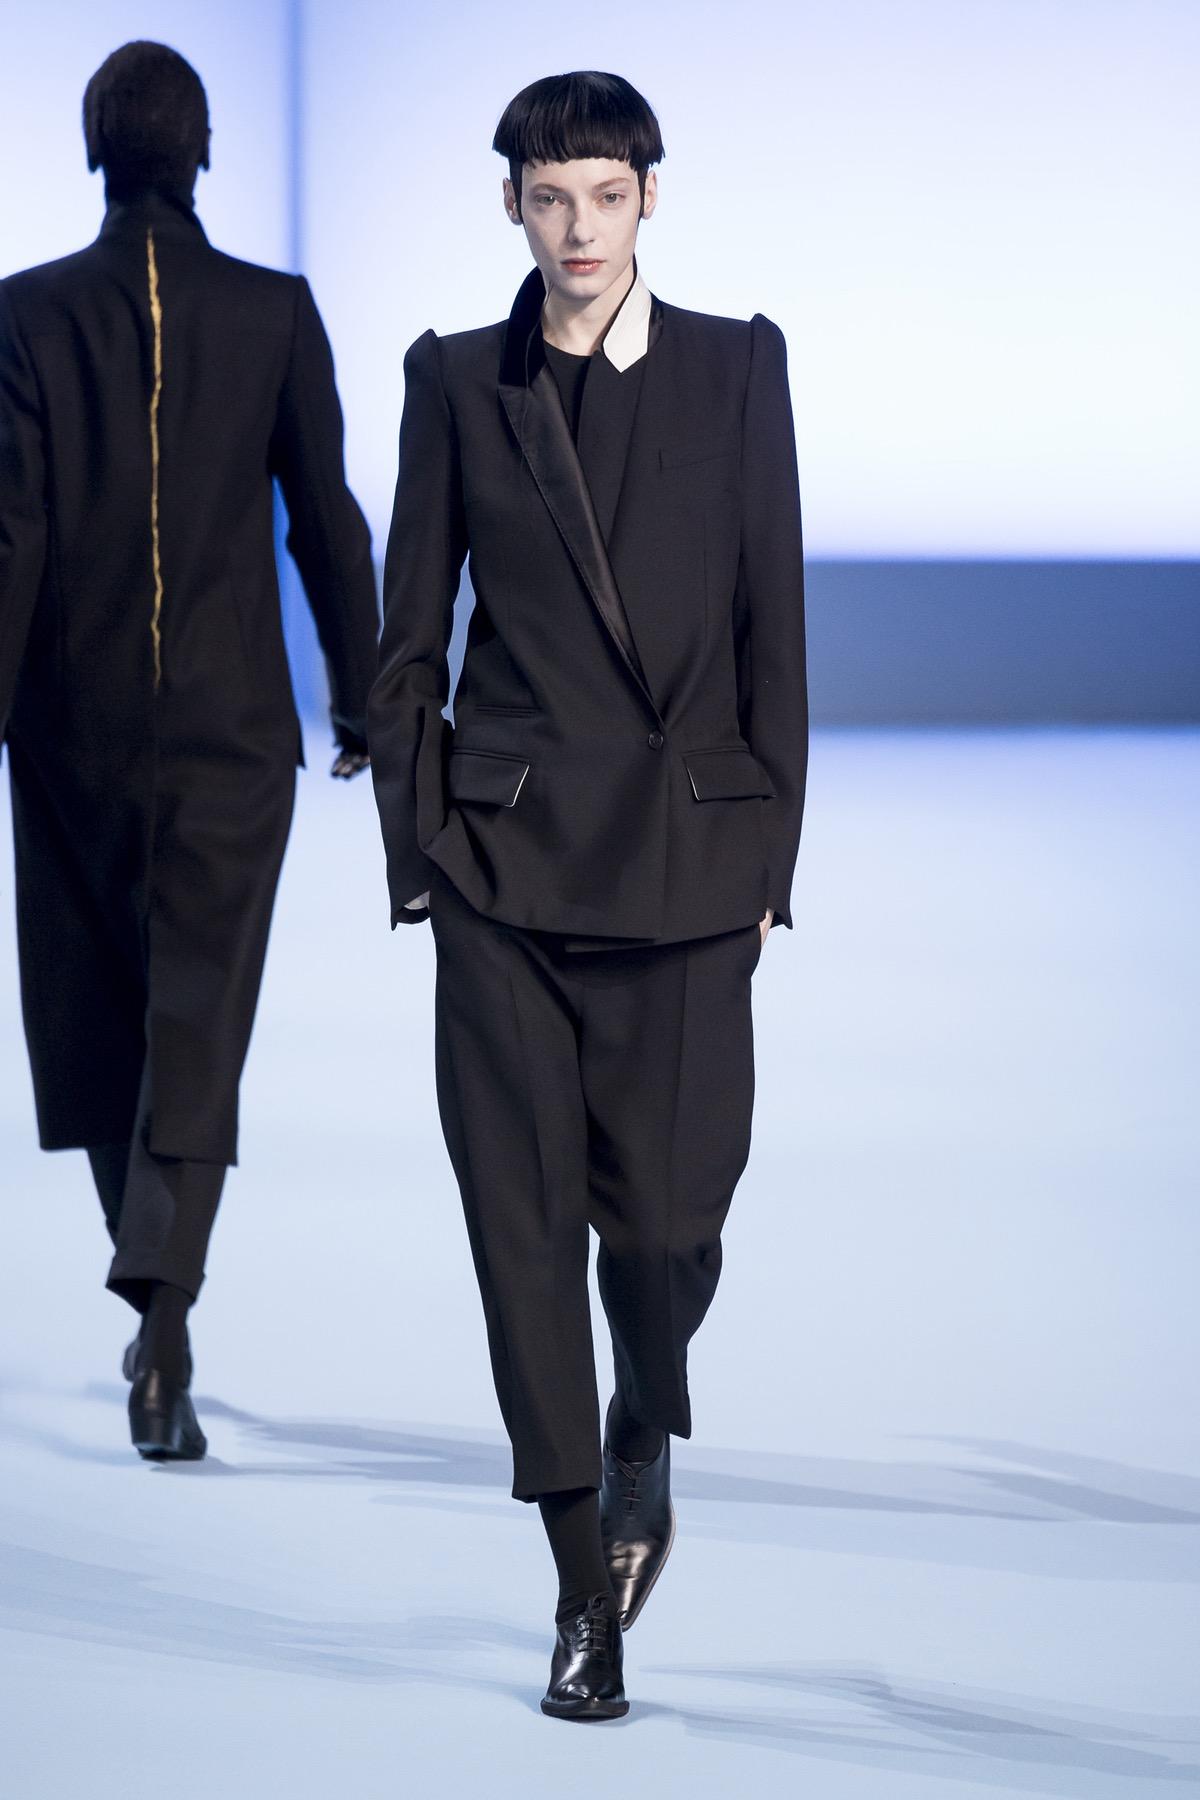 Haider Ackermann Autumn 2017, image via The Business Of Fashion